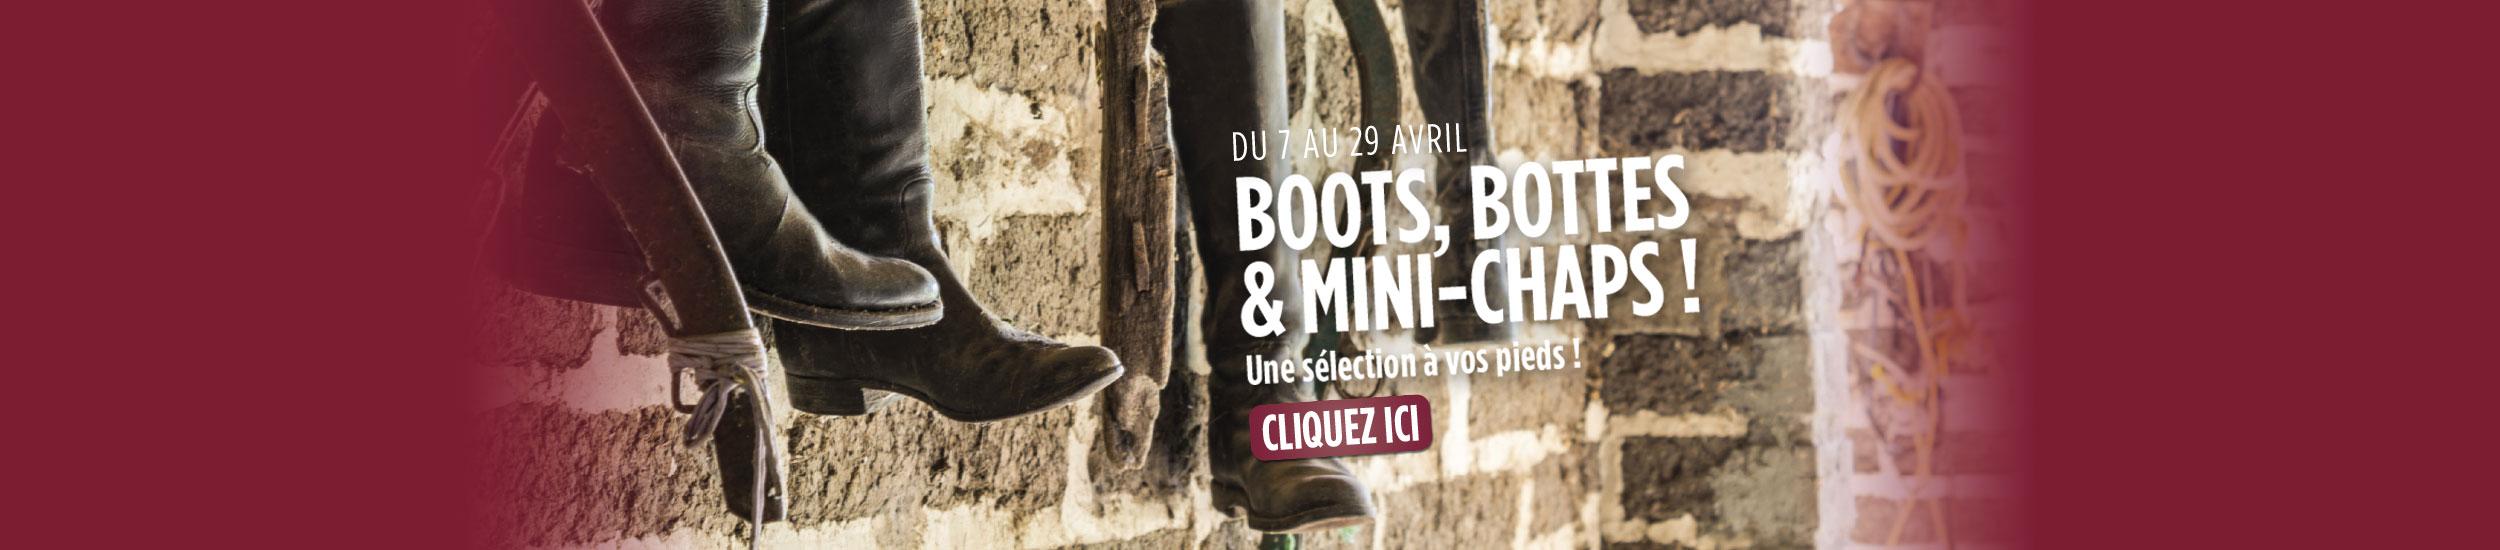 Boots, Bottes & Mini-chaps !